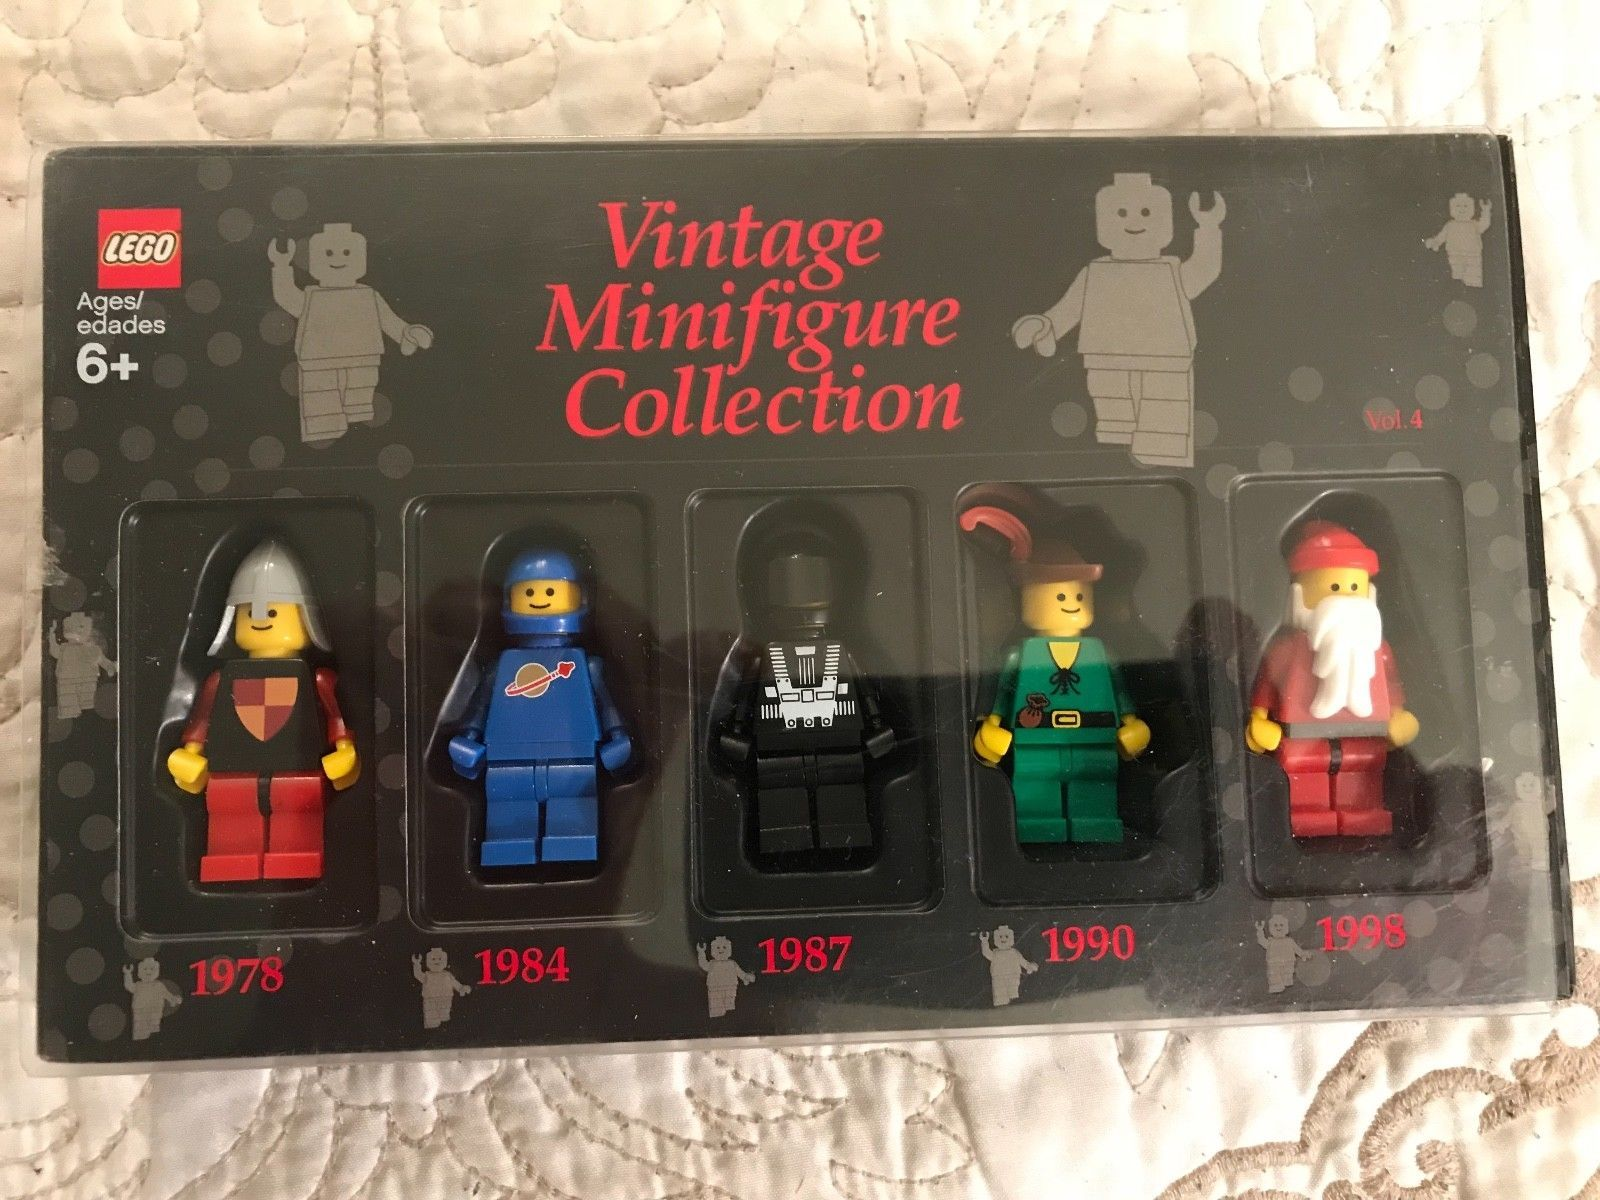 Lego Vintage Minifigure Collection Vol 4 Black 852753 5 Vintage Figures